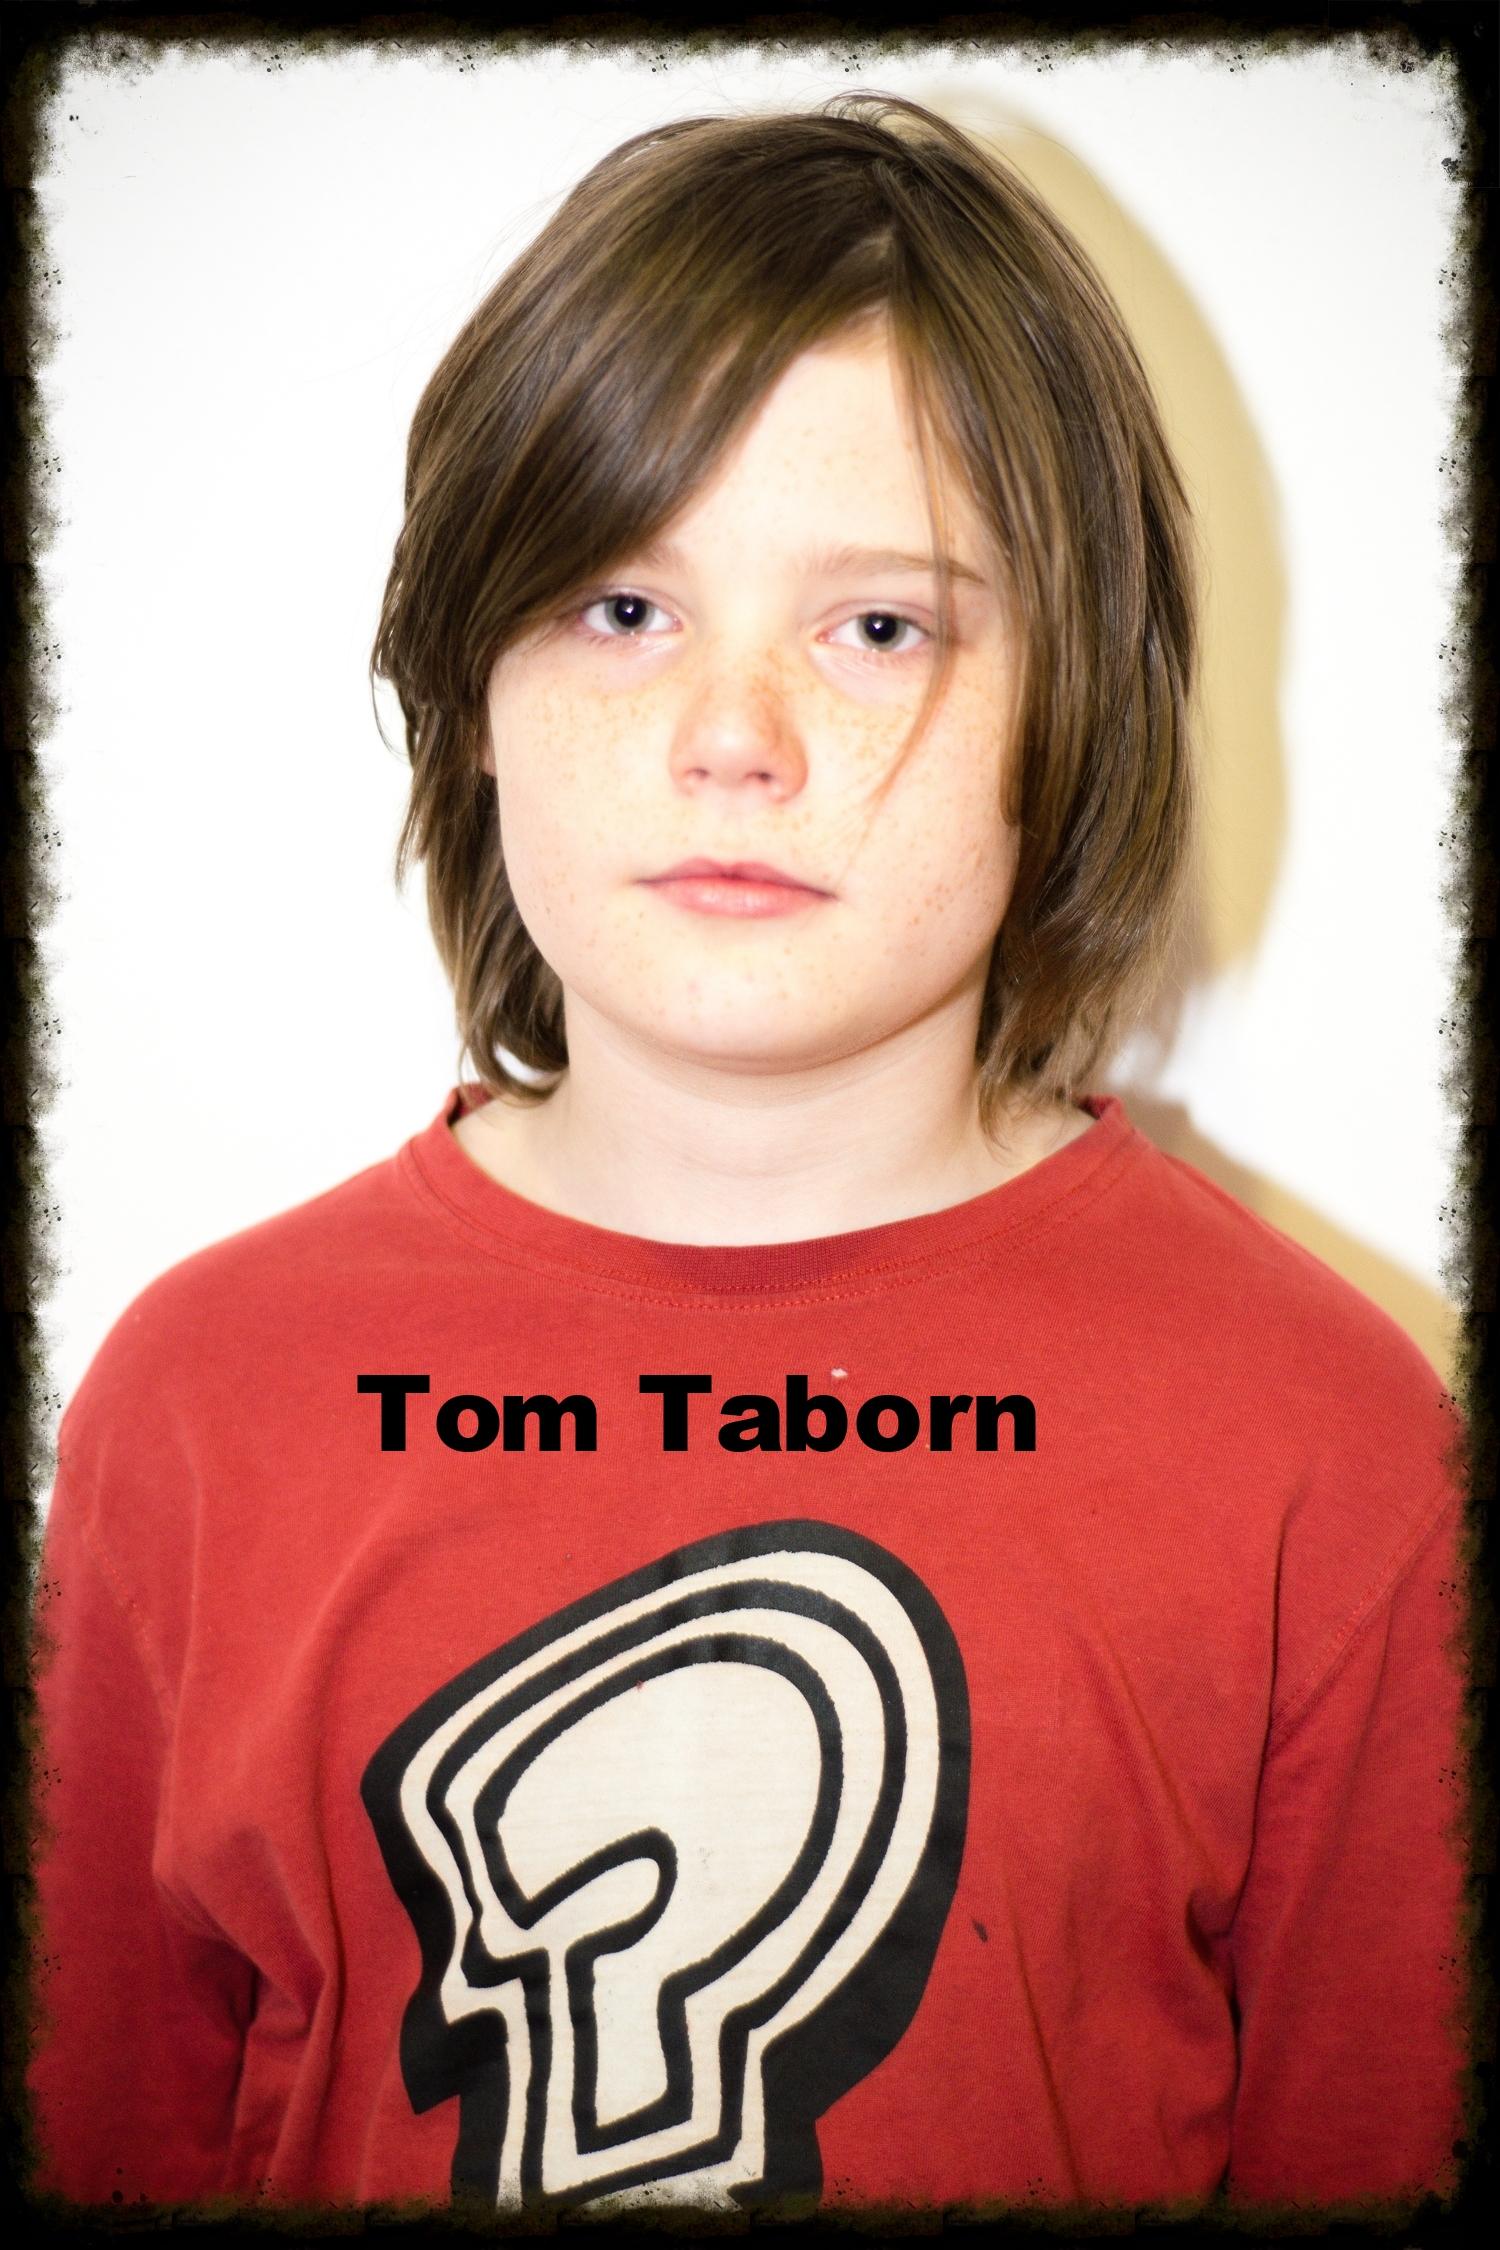 INTRODUCING TOM TABORN